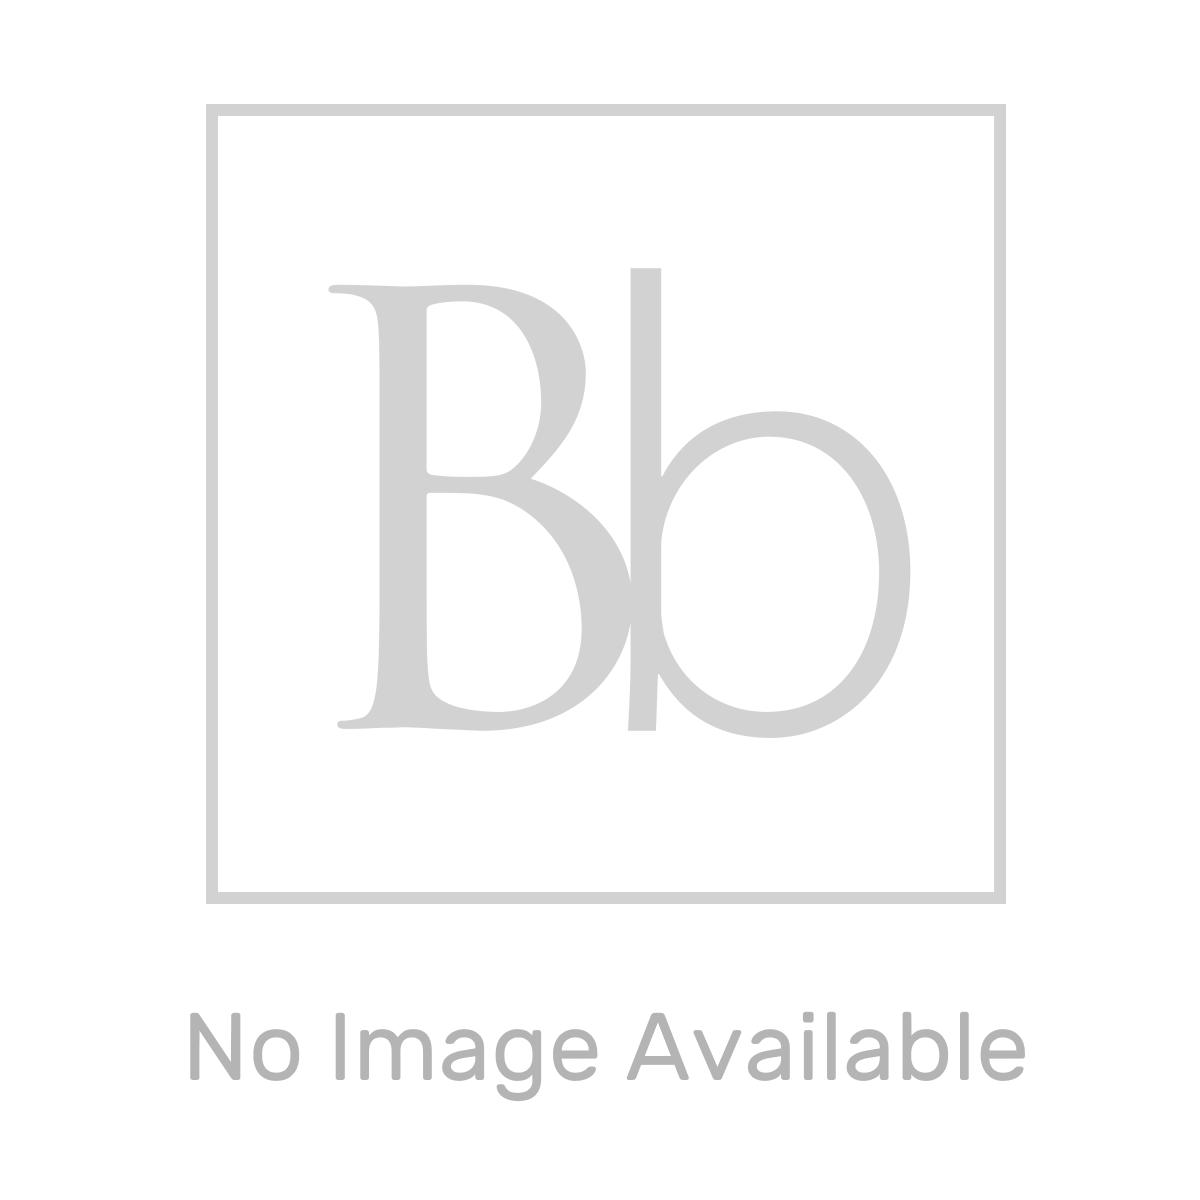 Hudson Reed Sottile Wall Mounted Basin Mixer Tap Dimensions